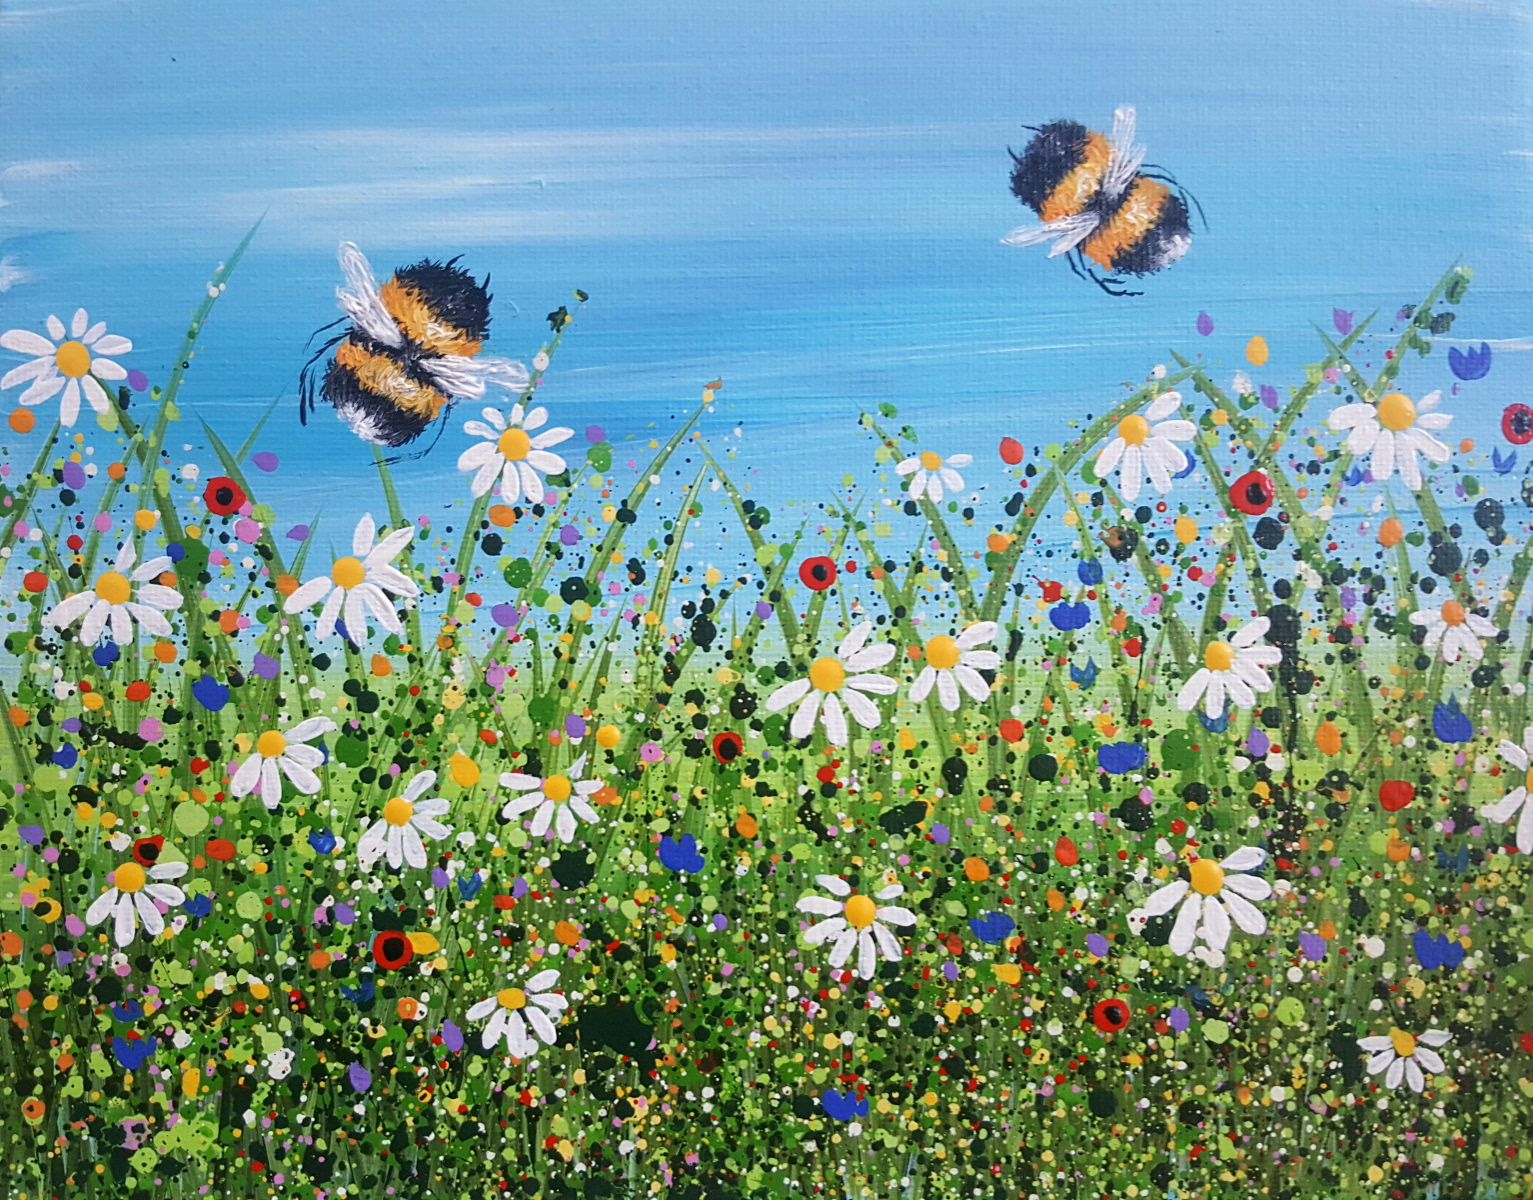 Bumble Bee & Daisies #2